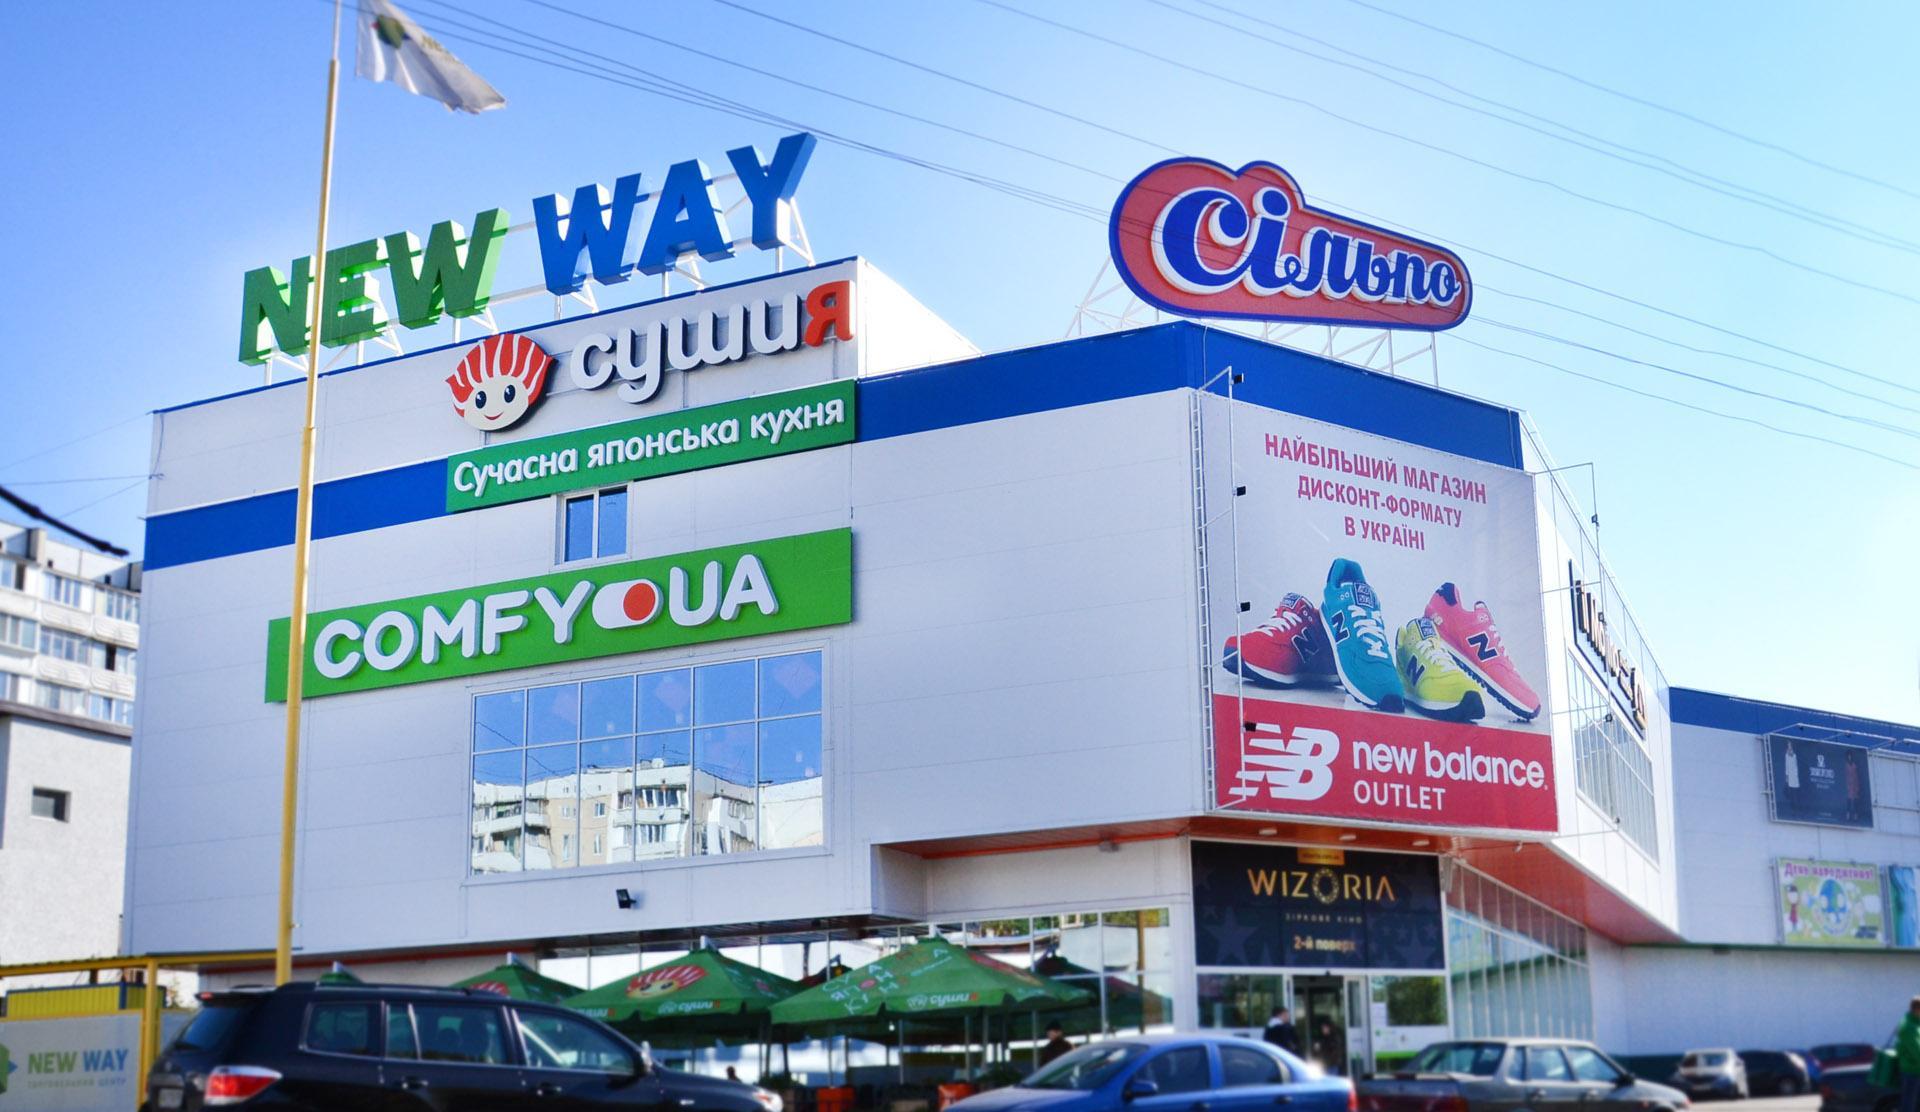 Брендинг of the shopping center